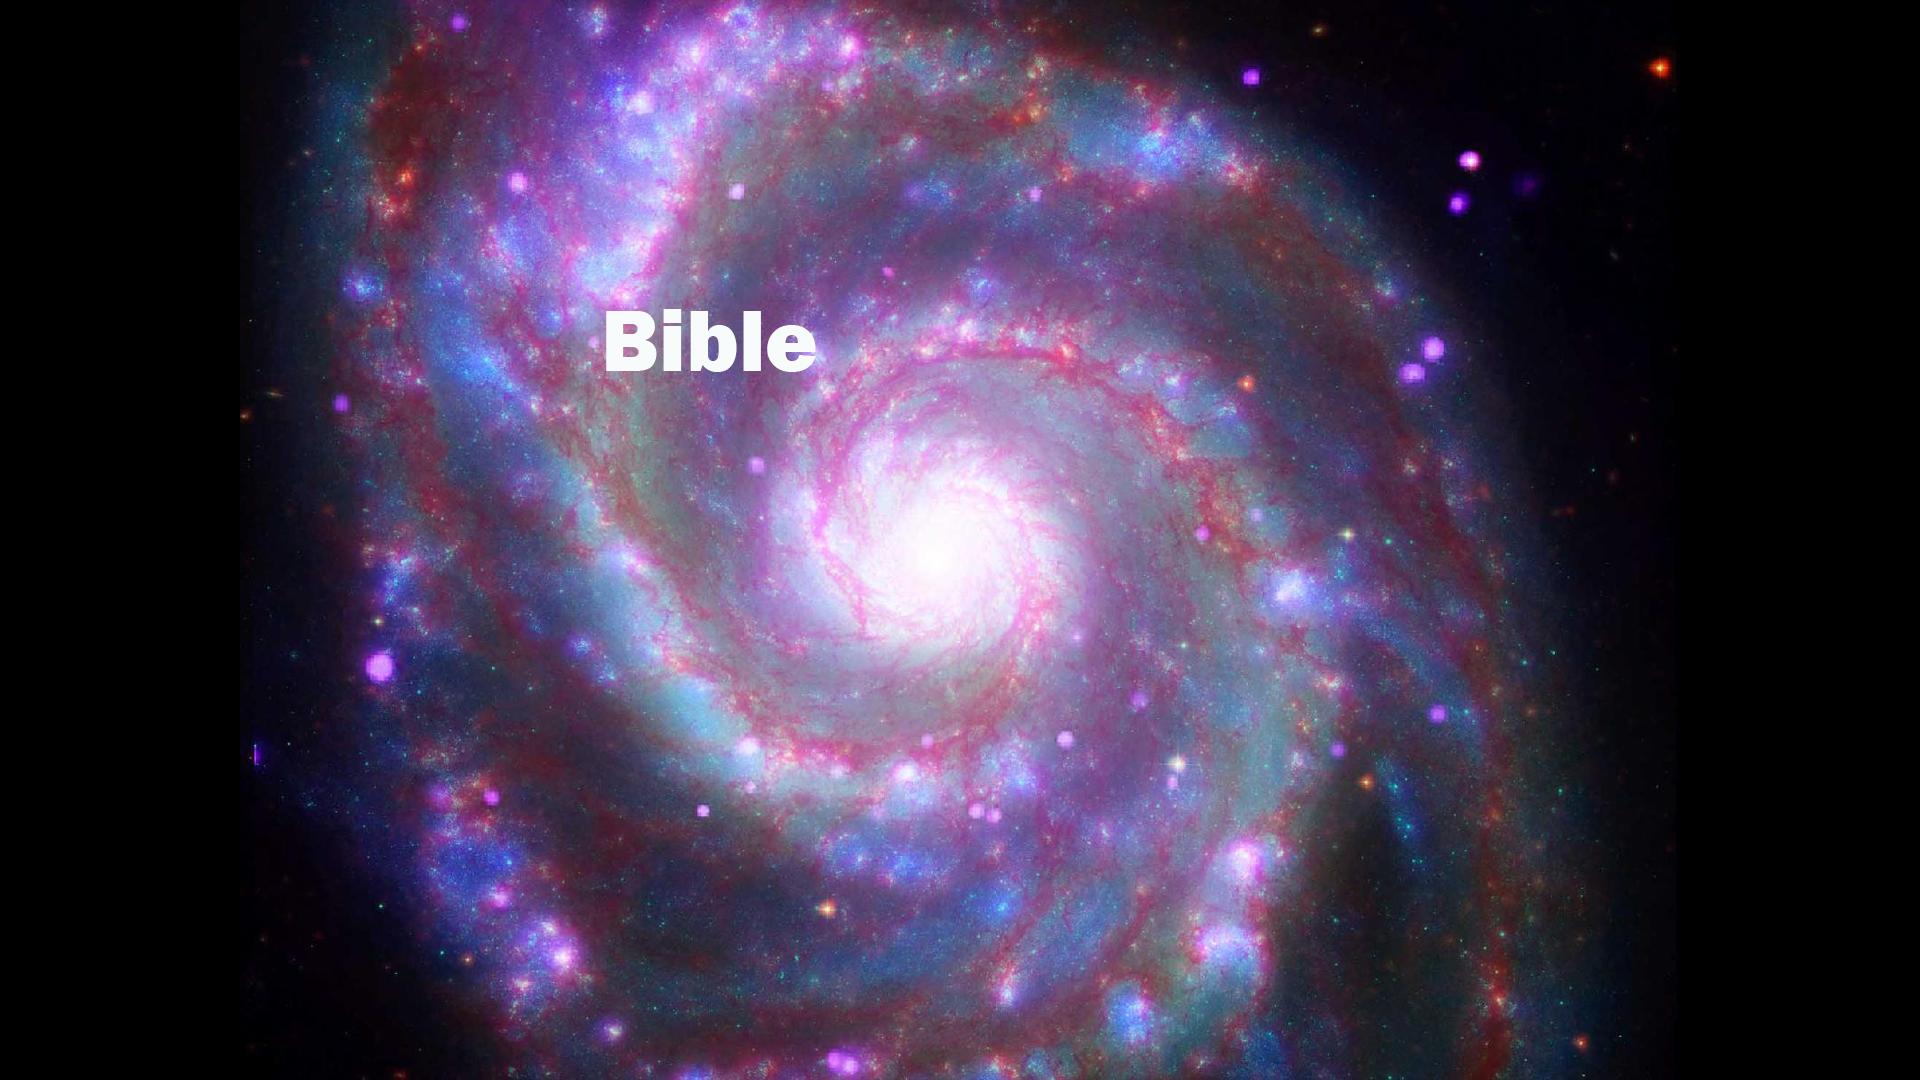 Milky Way 1 - Bible.jpg